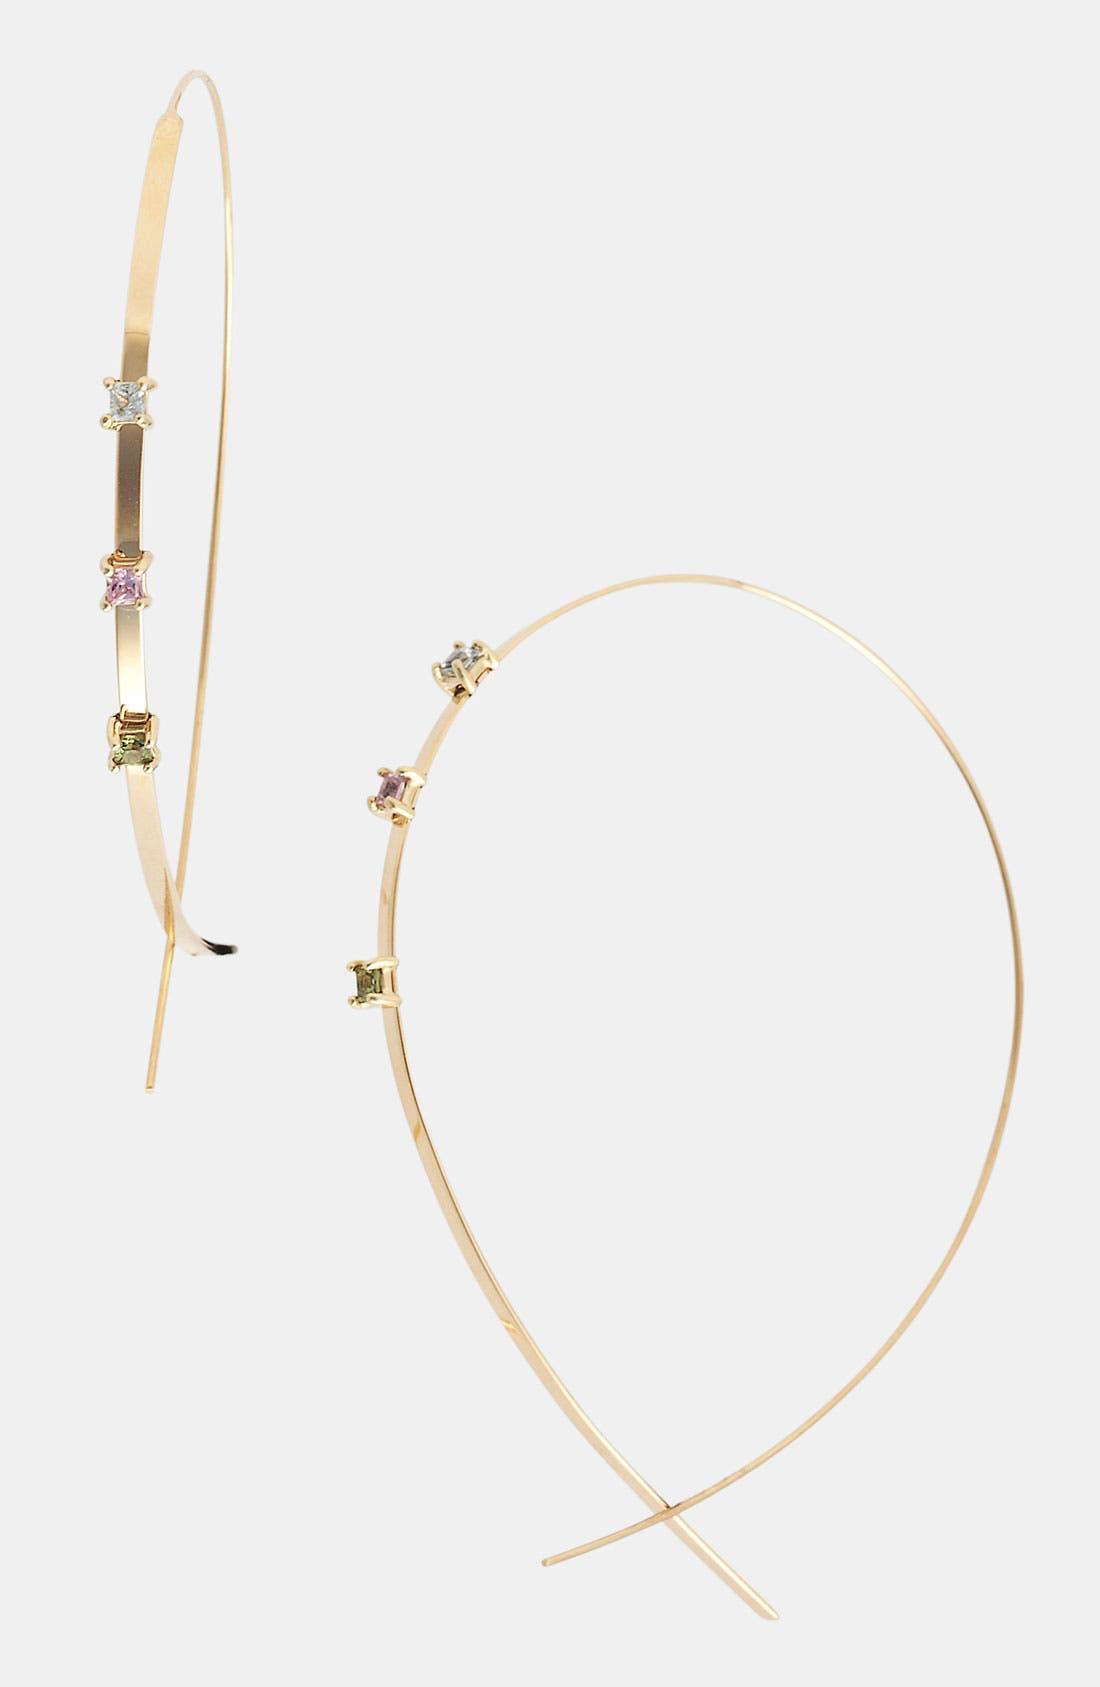 Main Image - Lana Jewelry 'Large Ombré Upside Down' Hoop Earrings